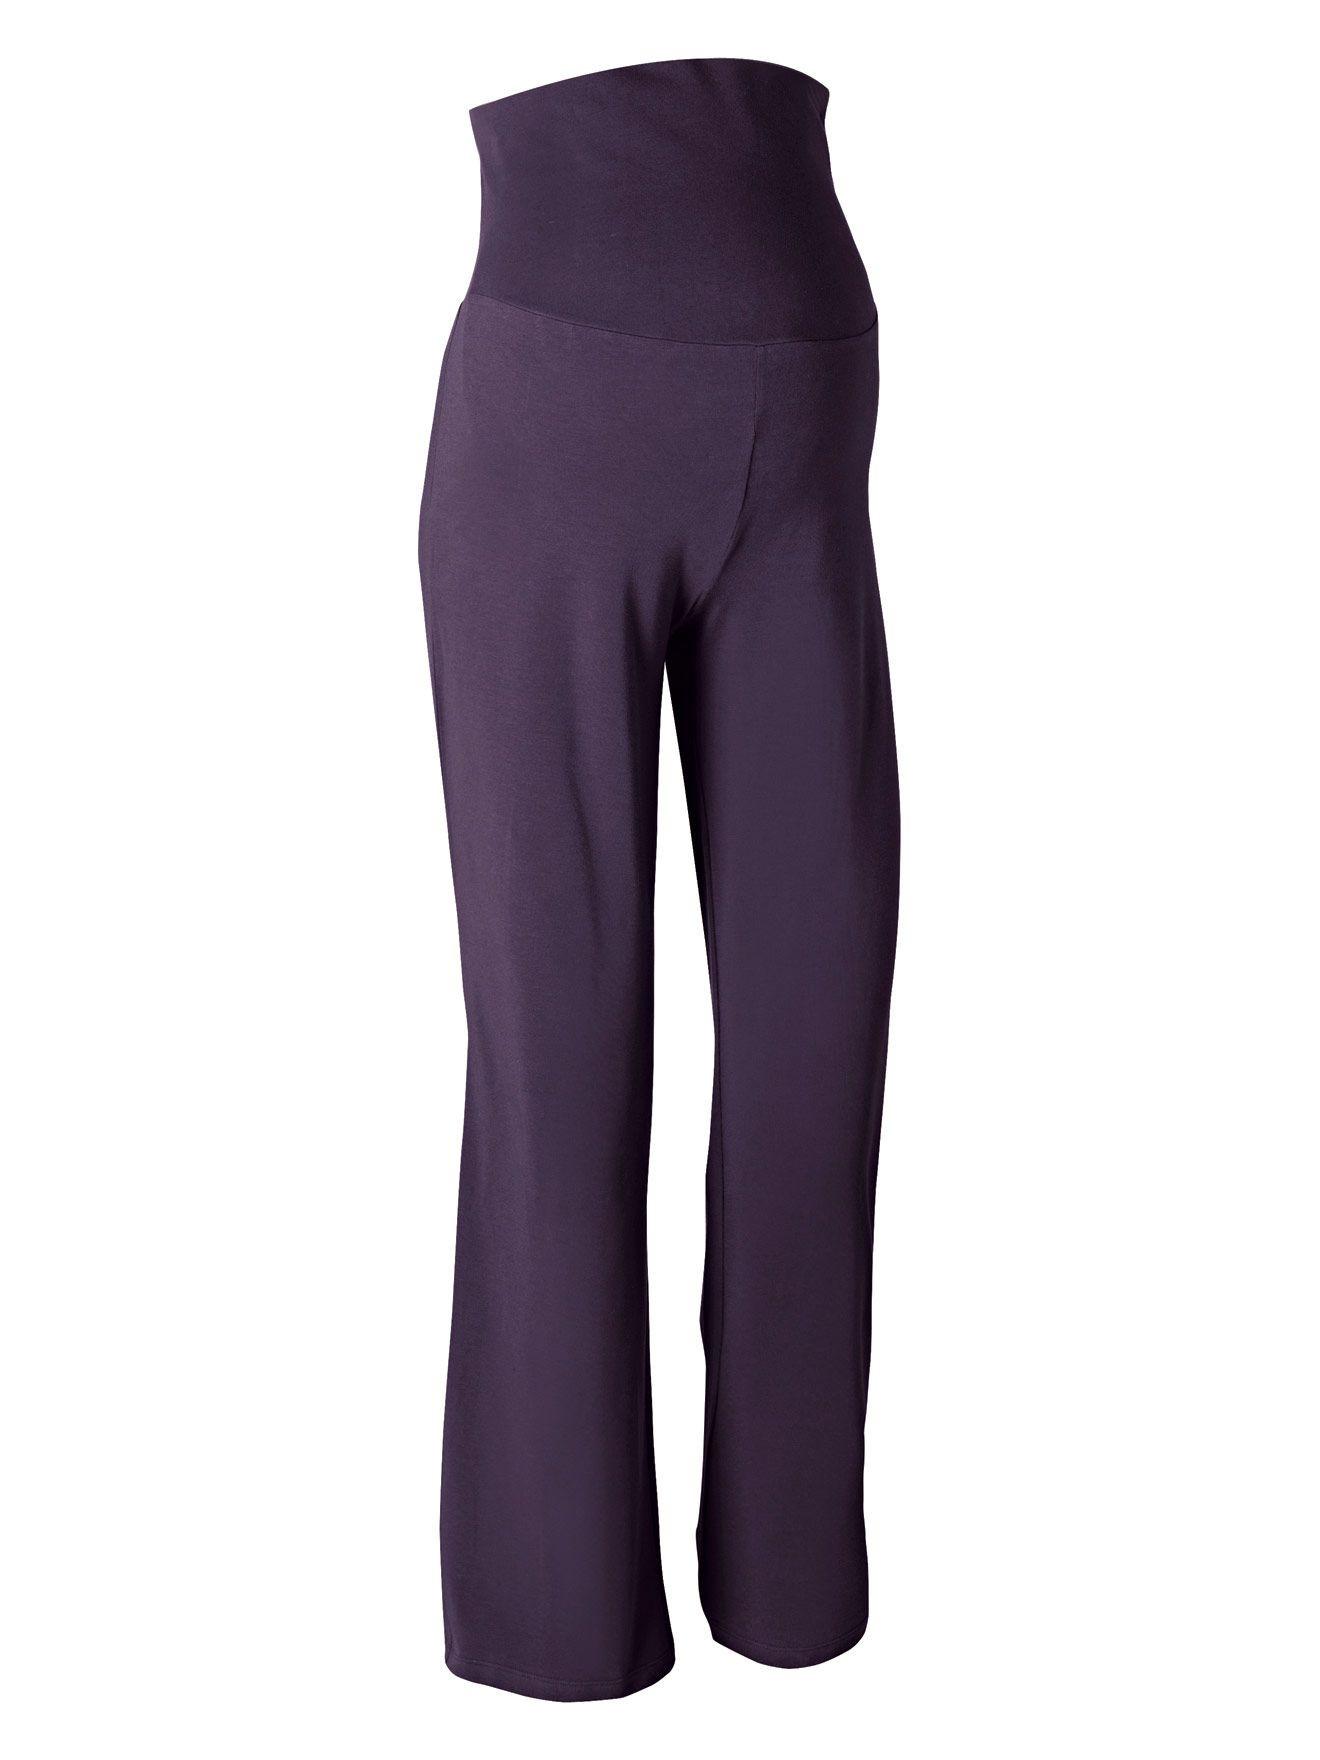 pantalon de grossesse yoga coton bio colline avis. Black Bedroom Furniture Sets. Home Design Ideas